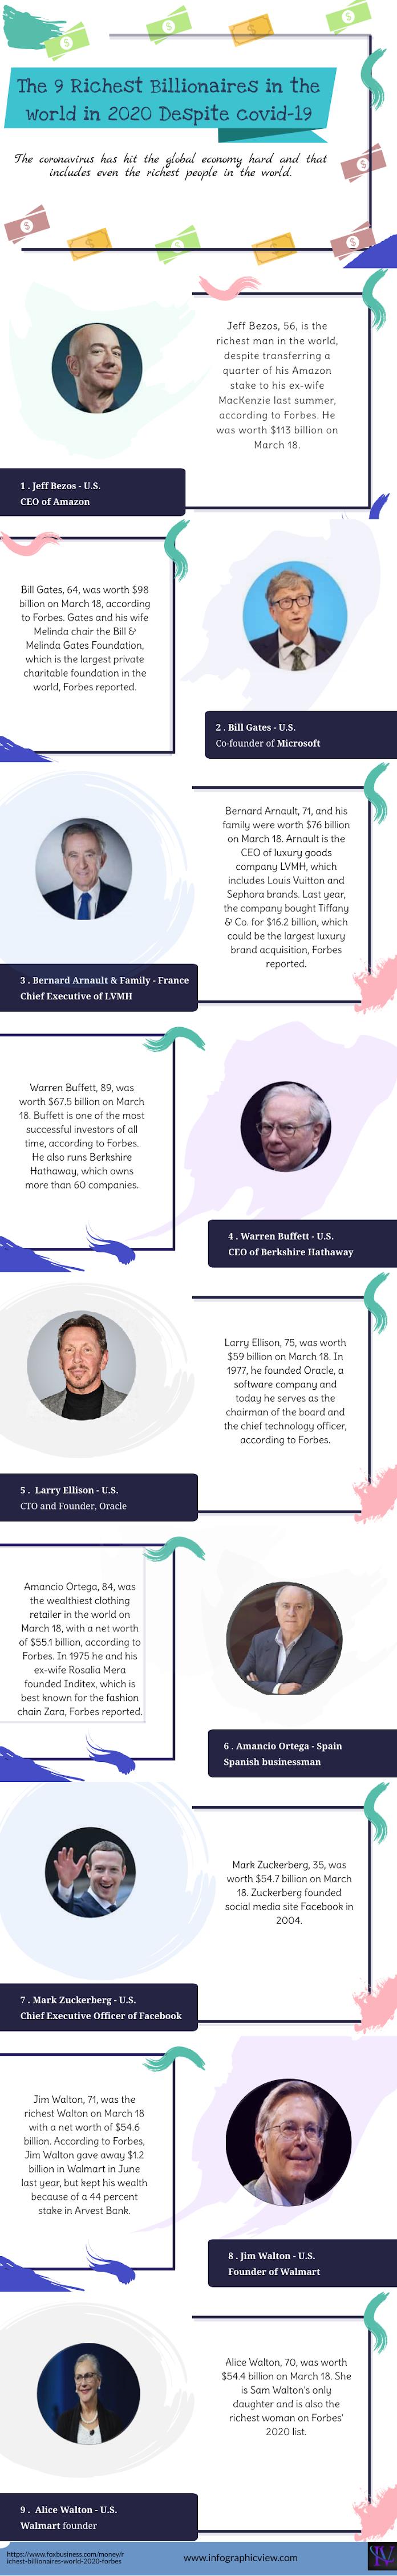 The 9 Richest Billionaires in the world in 2020 Despite covid-19 #infographic